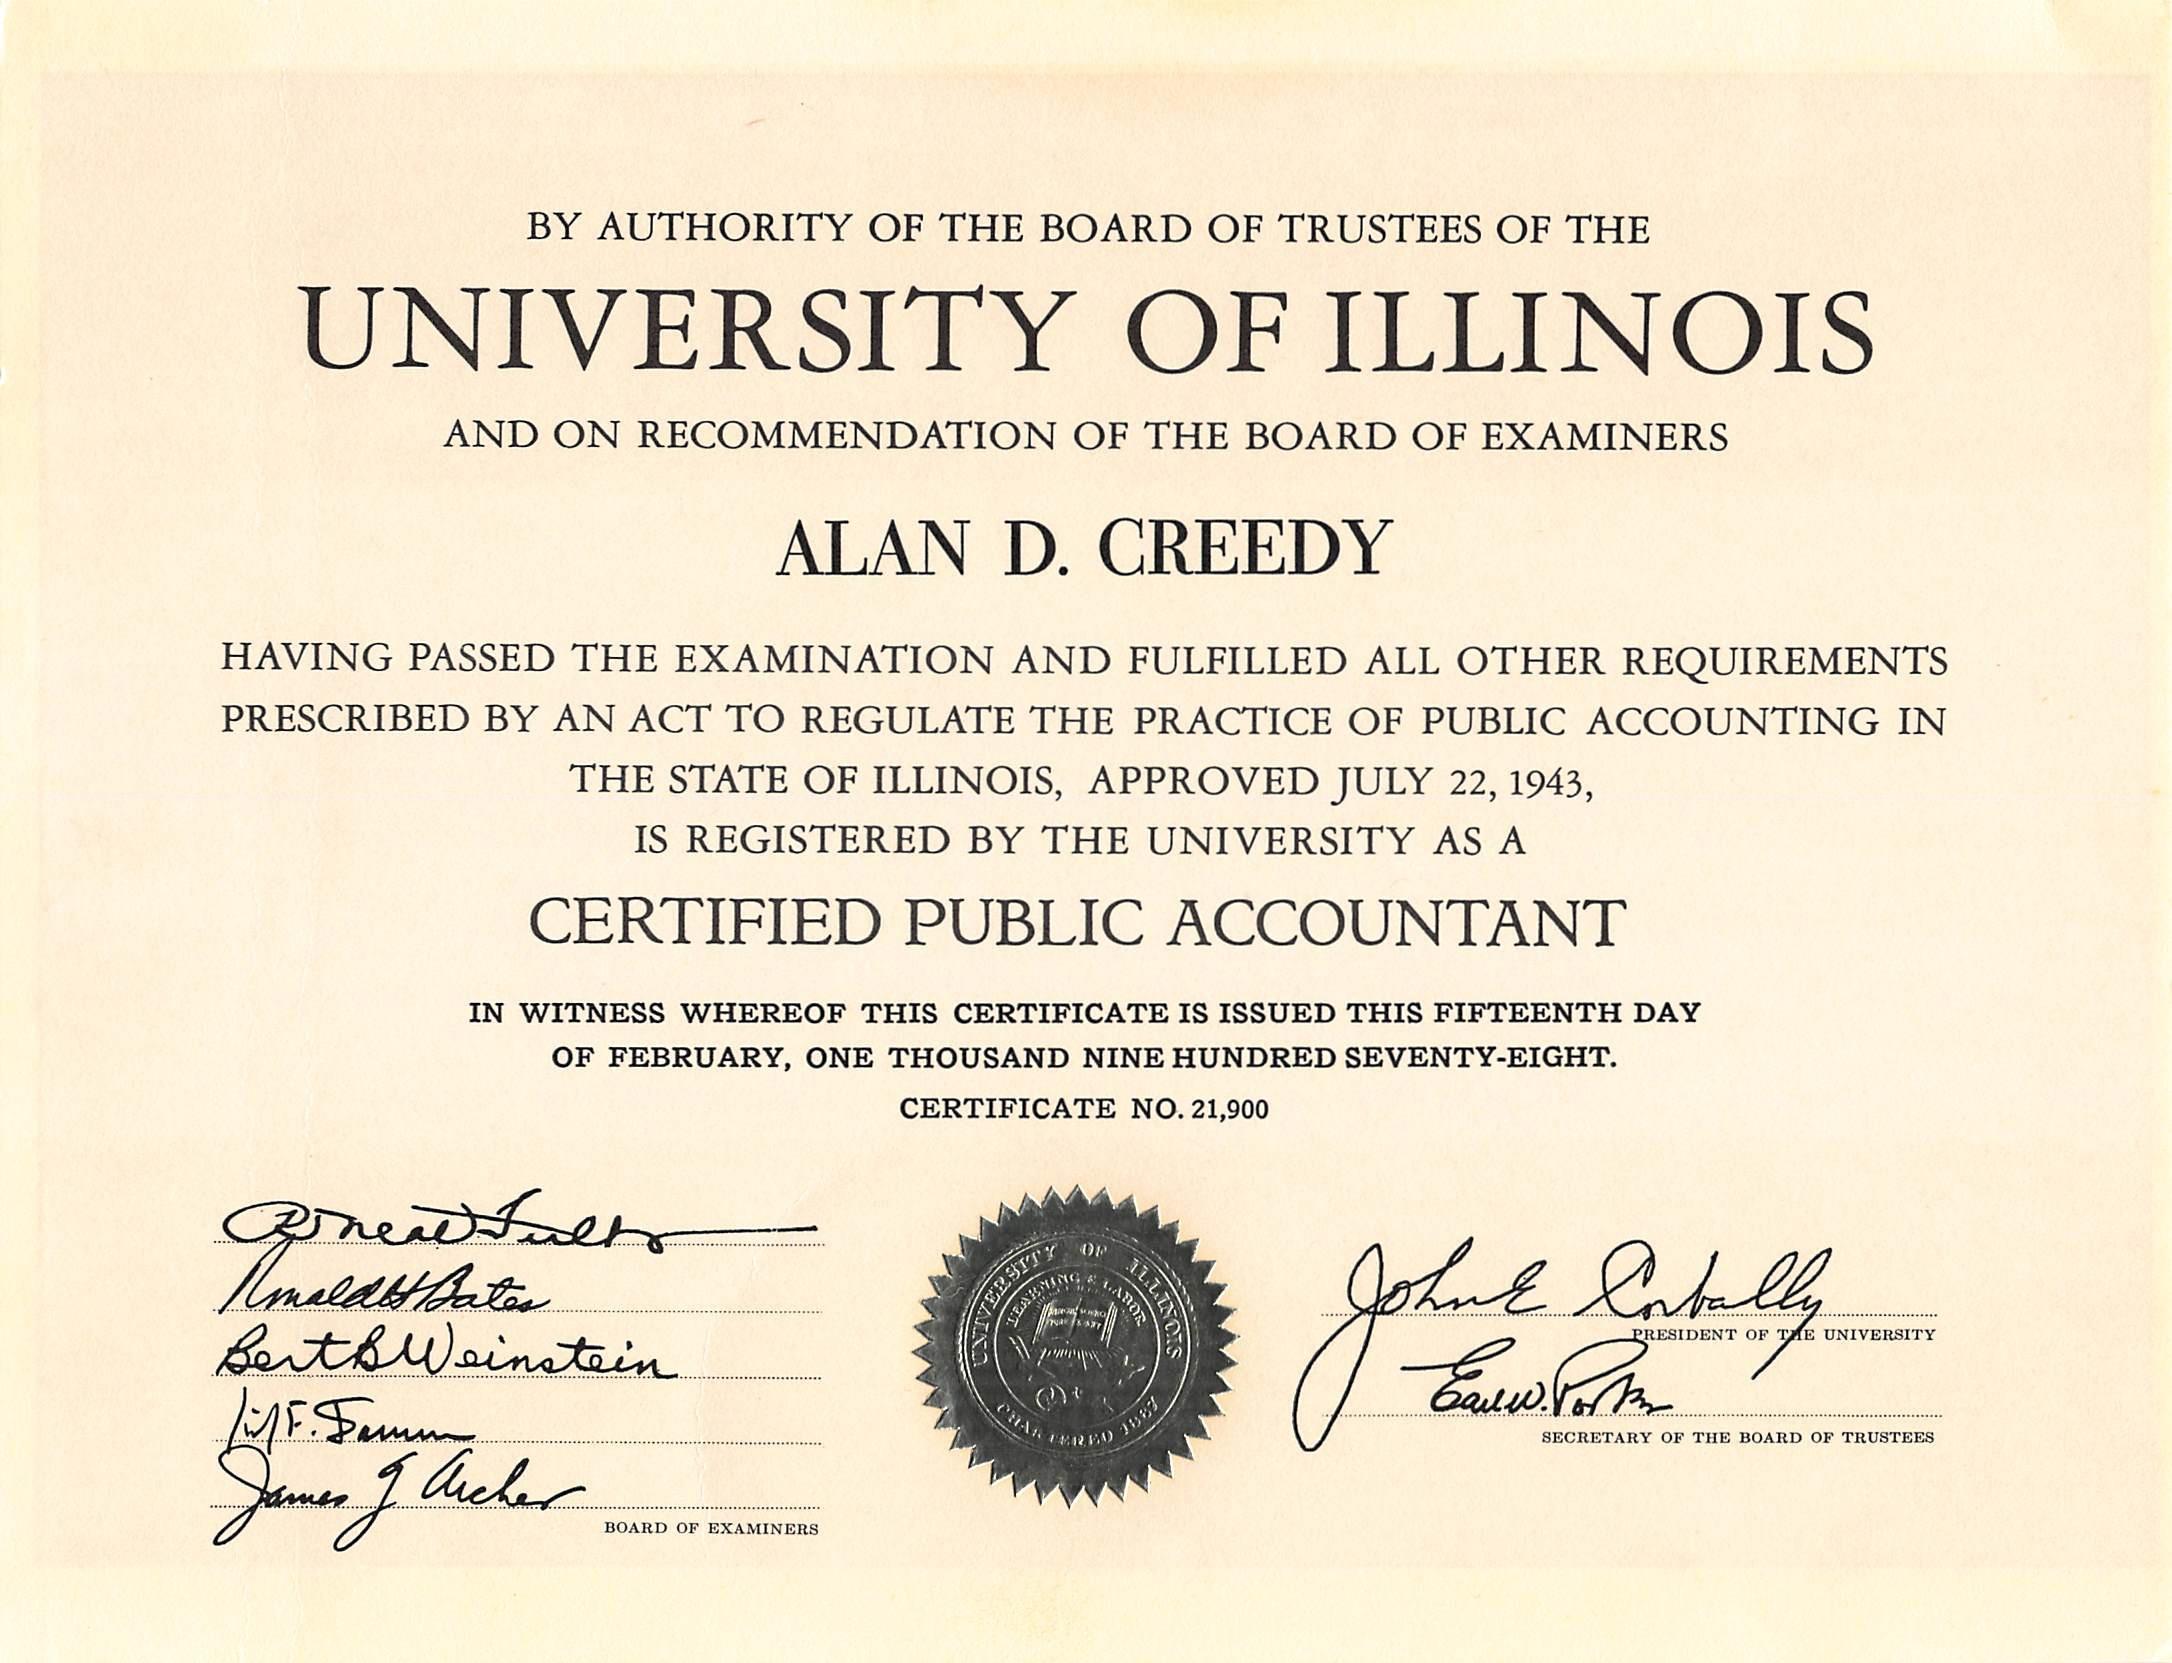 U Of I Certificate Alan Creedy